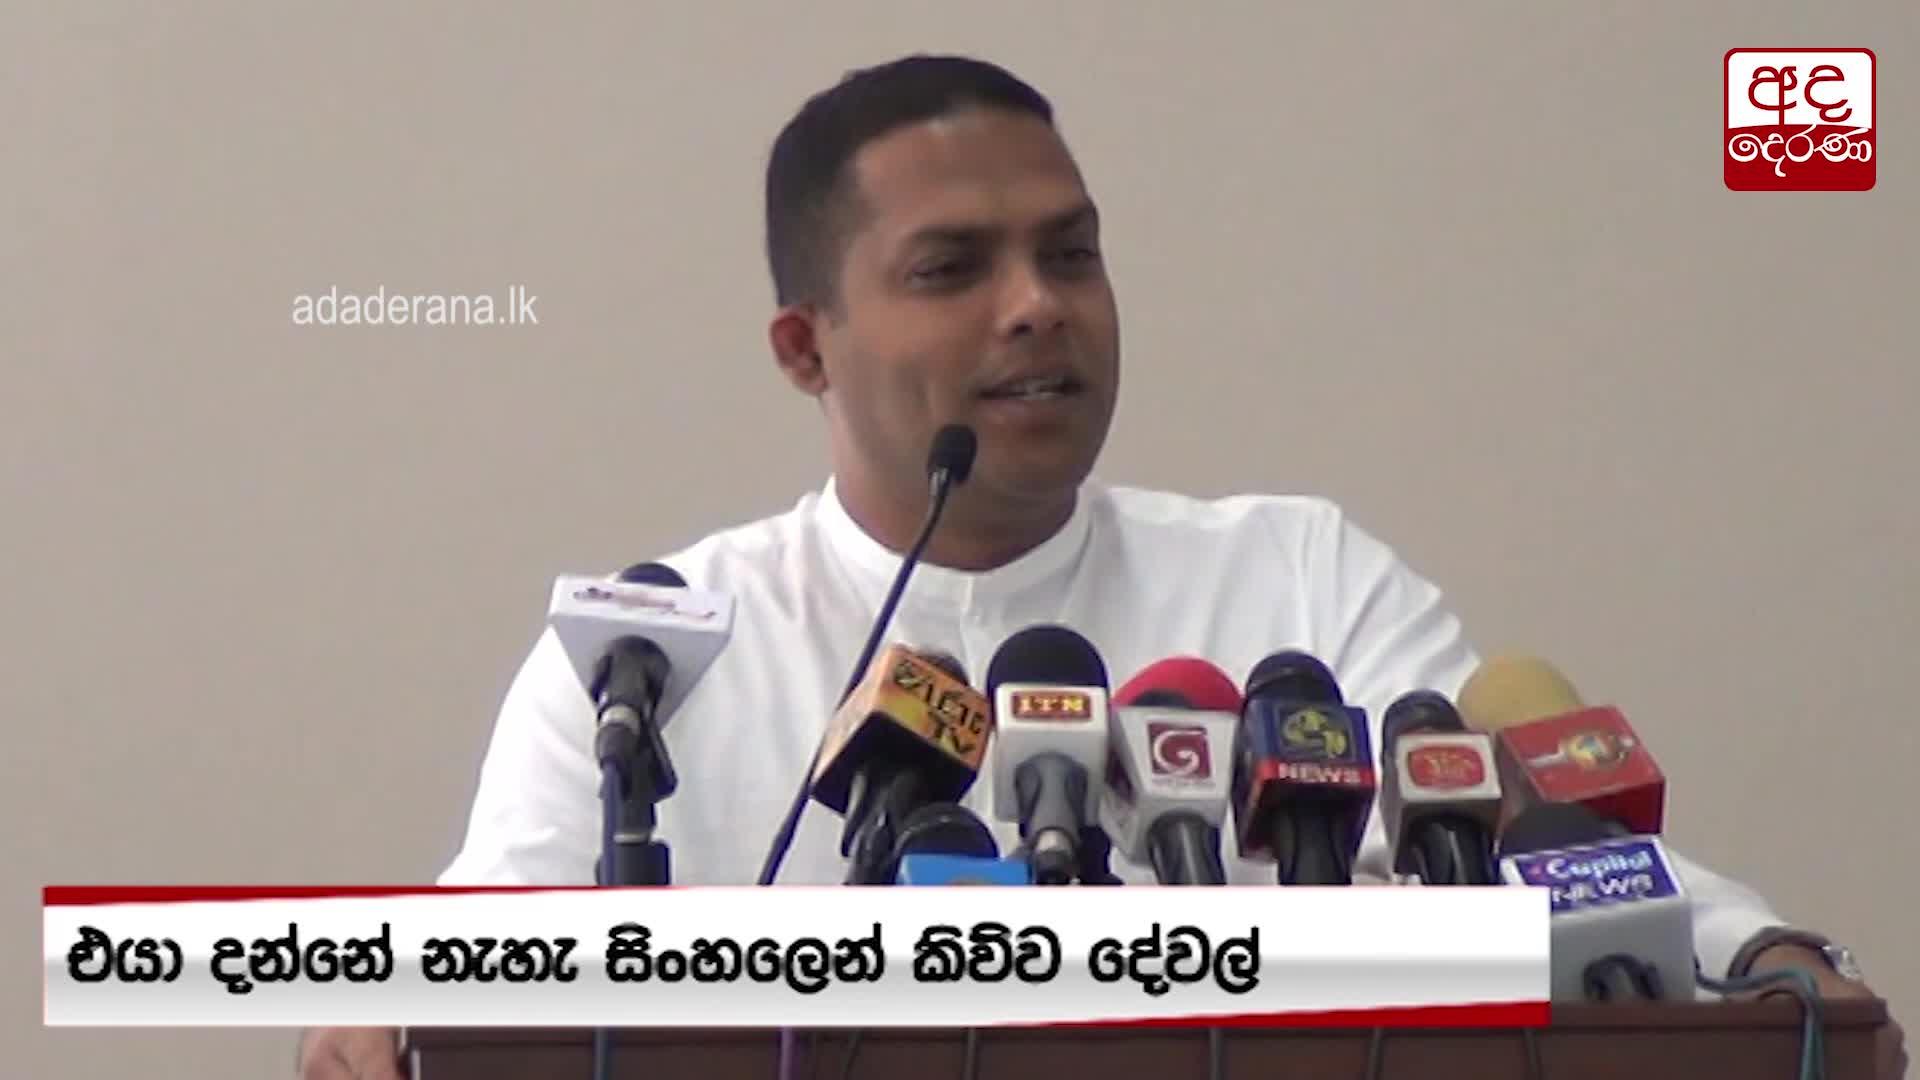 Sports Minister speaks on leaked video of SL cricket team